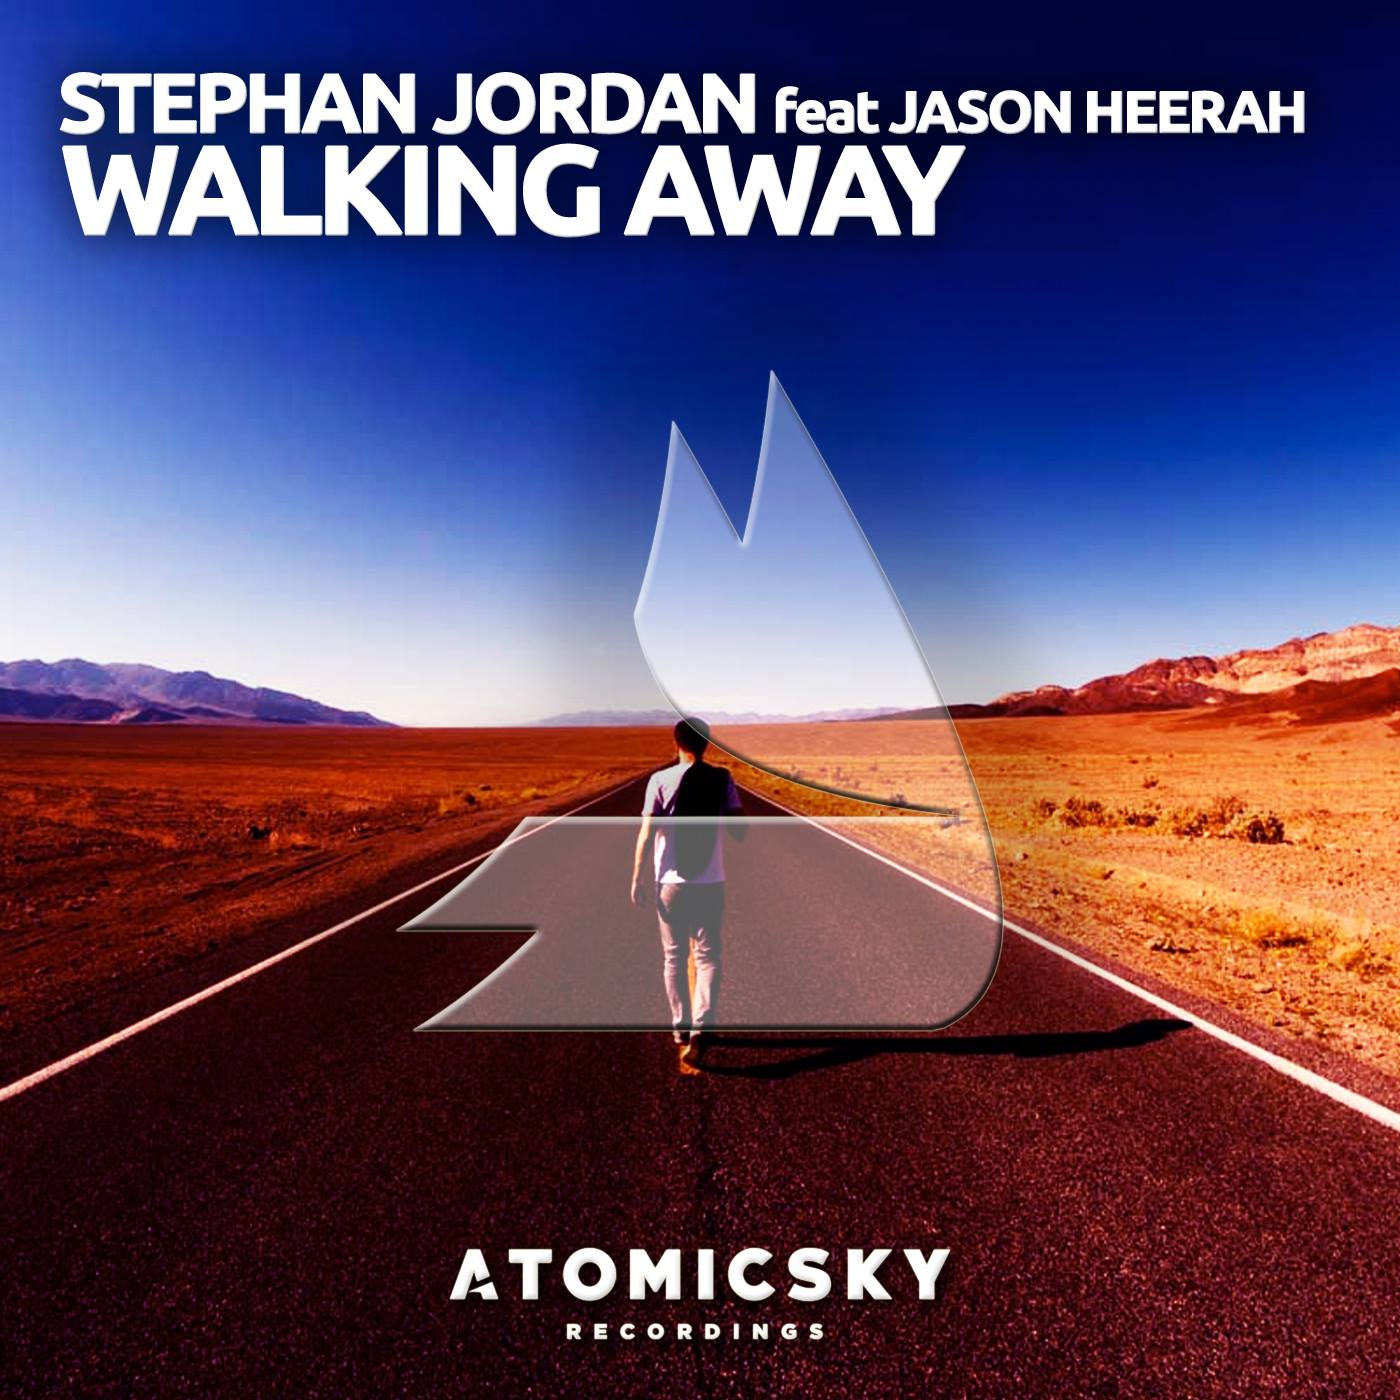 stephan_jordan_ft._jason_heerah_-_walking_away.jpg